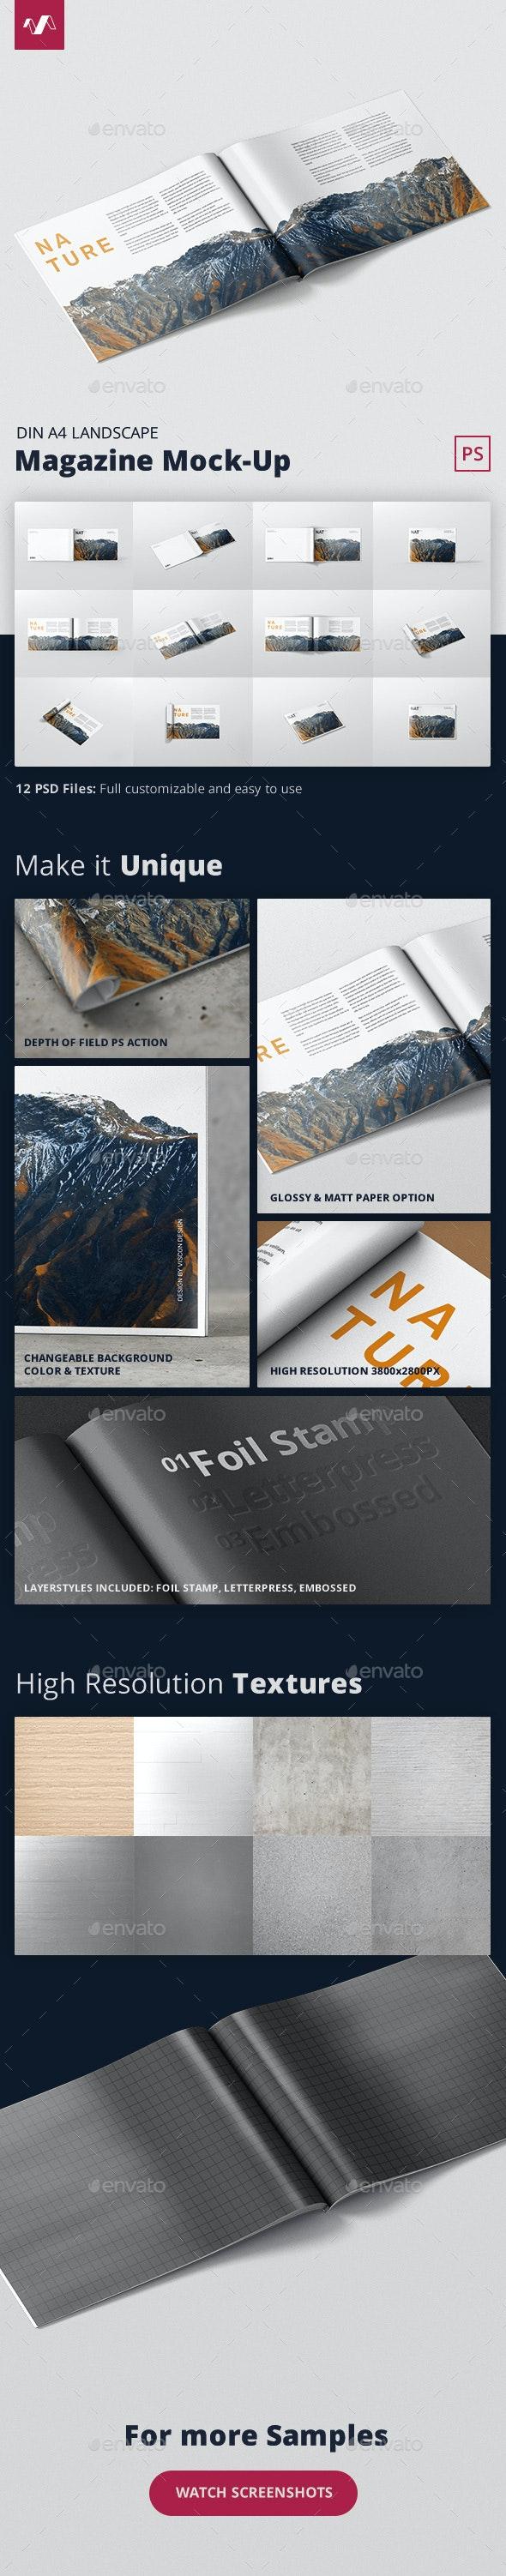 Magazine Mockup - A4 Landscape - Magazines Print